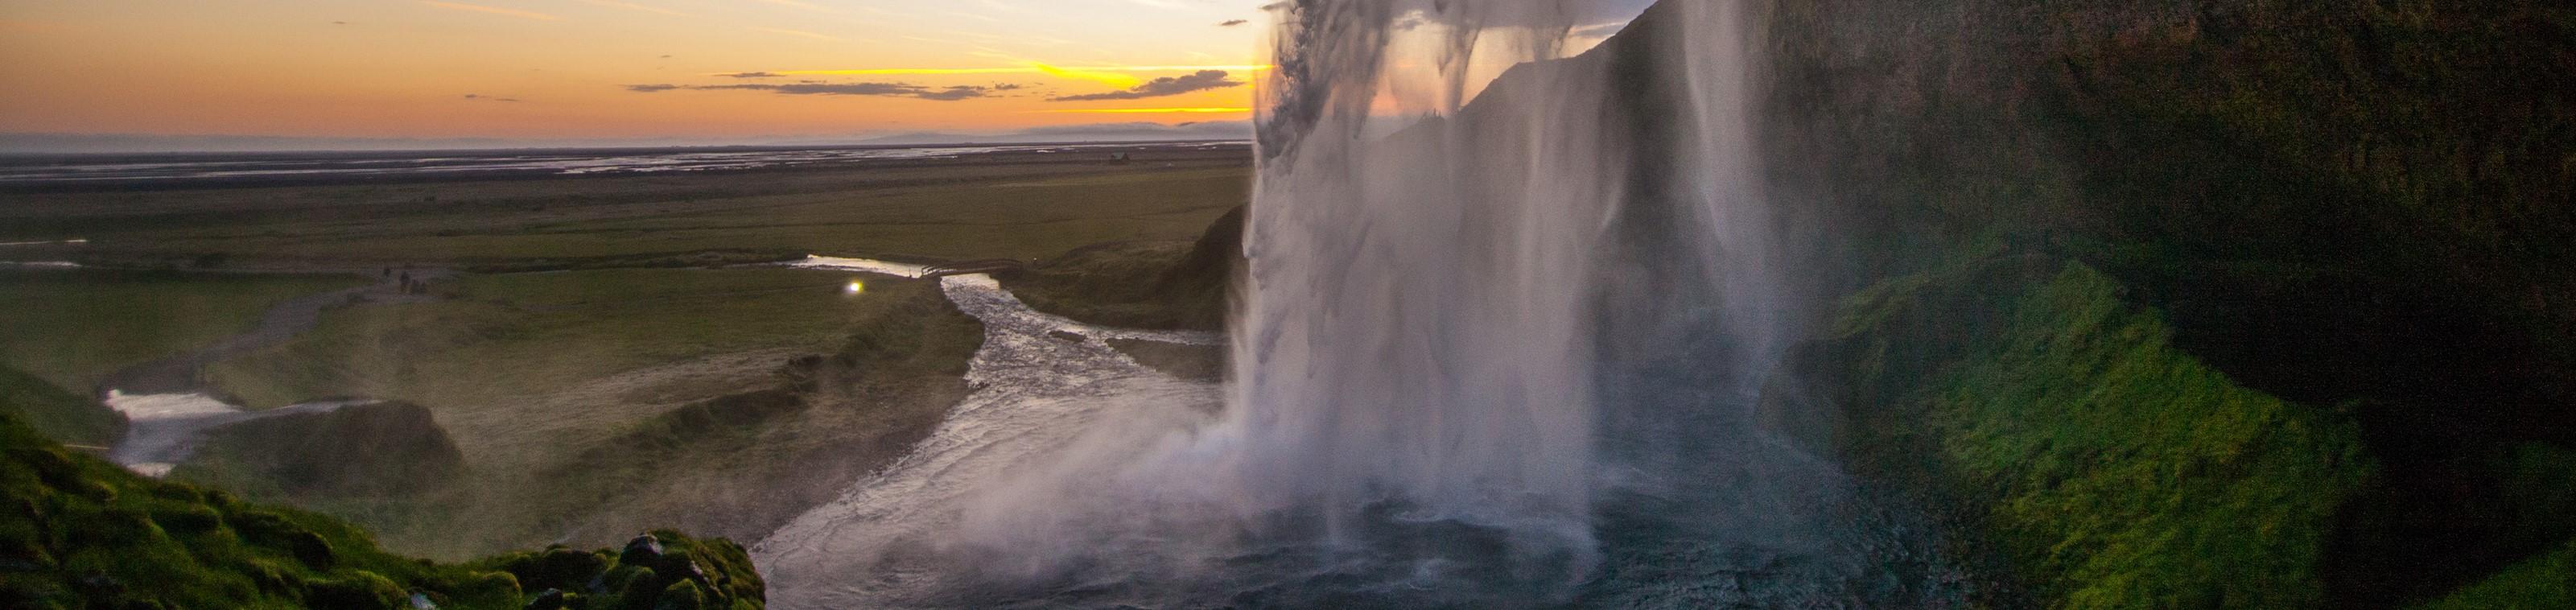 Autorondreis IJsland: Beauty of the South